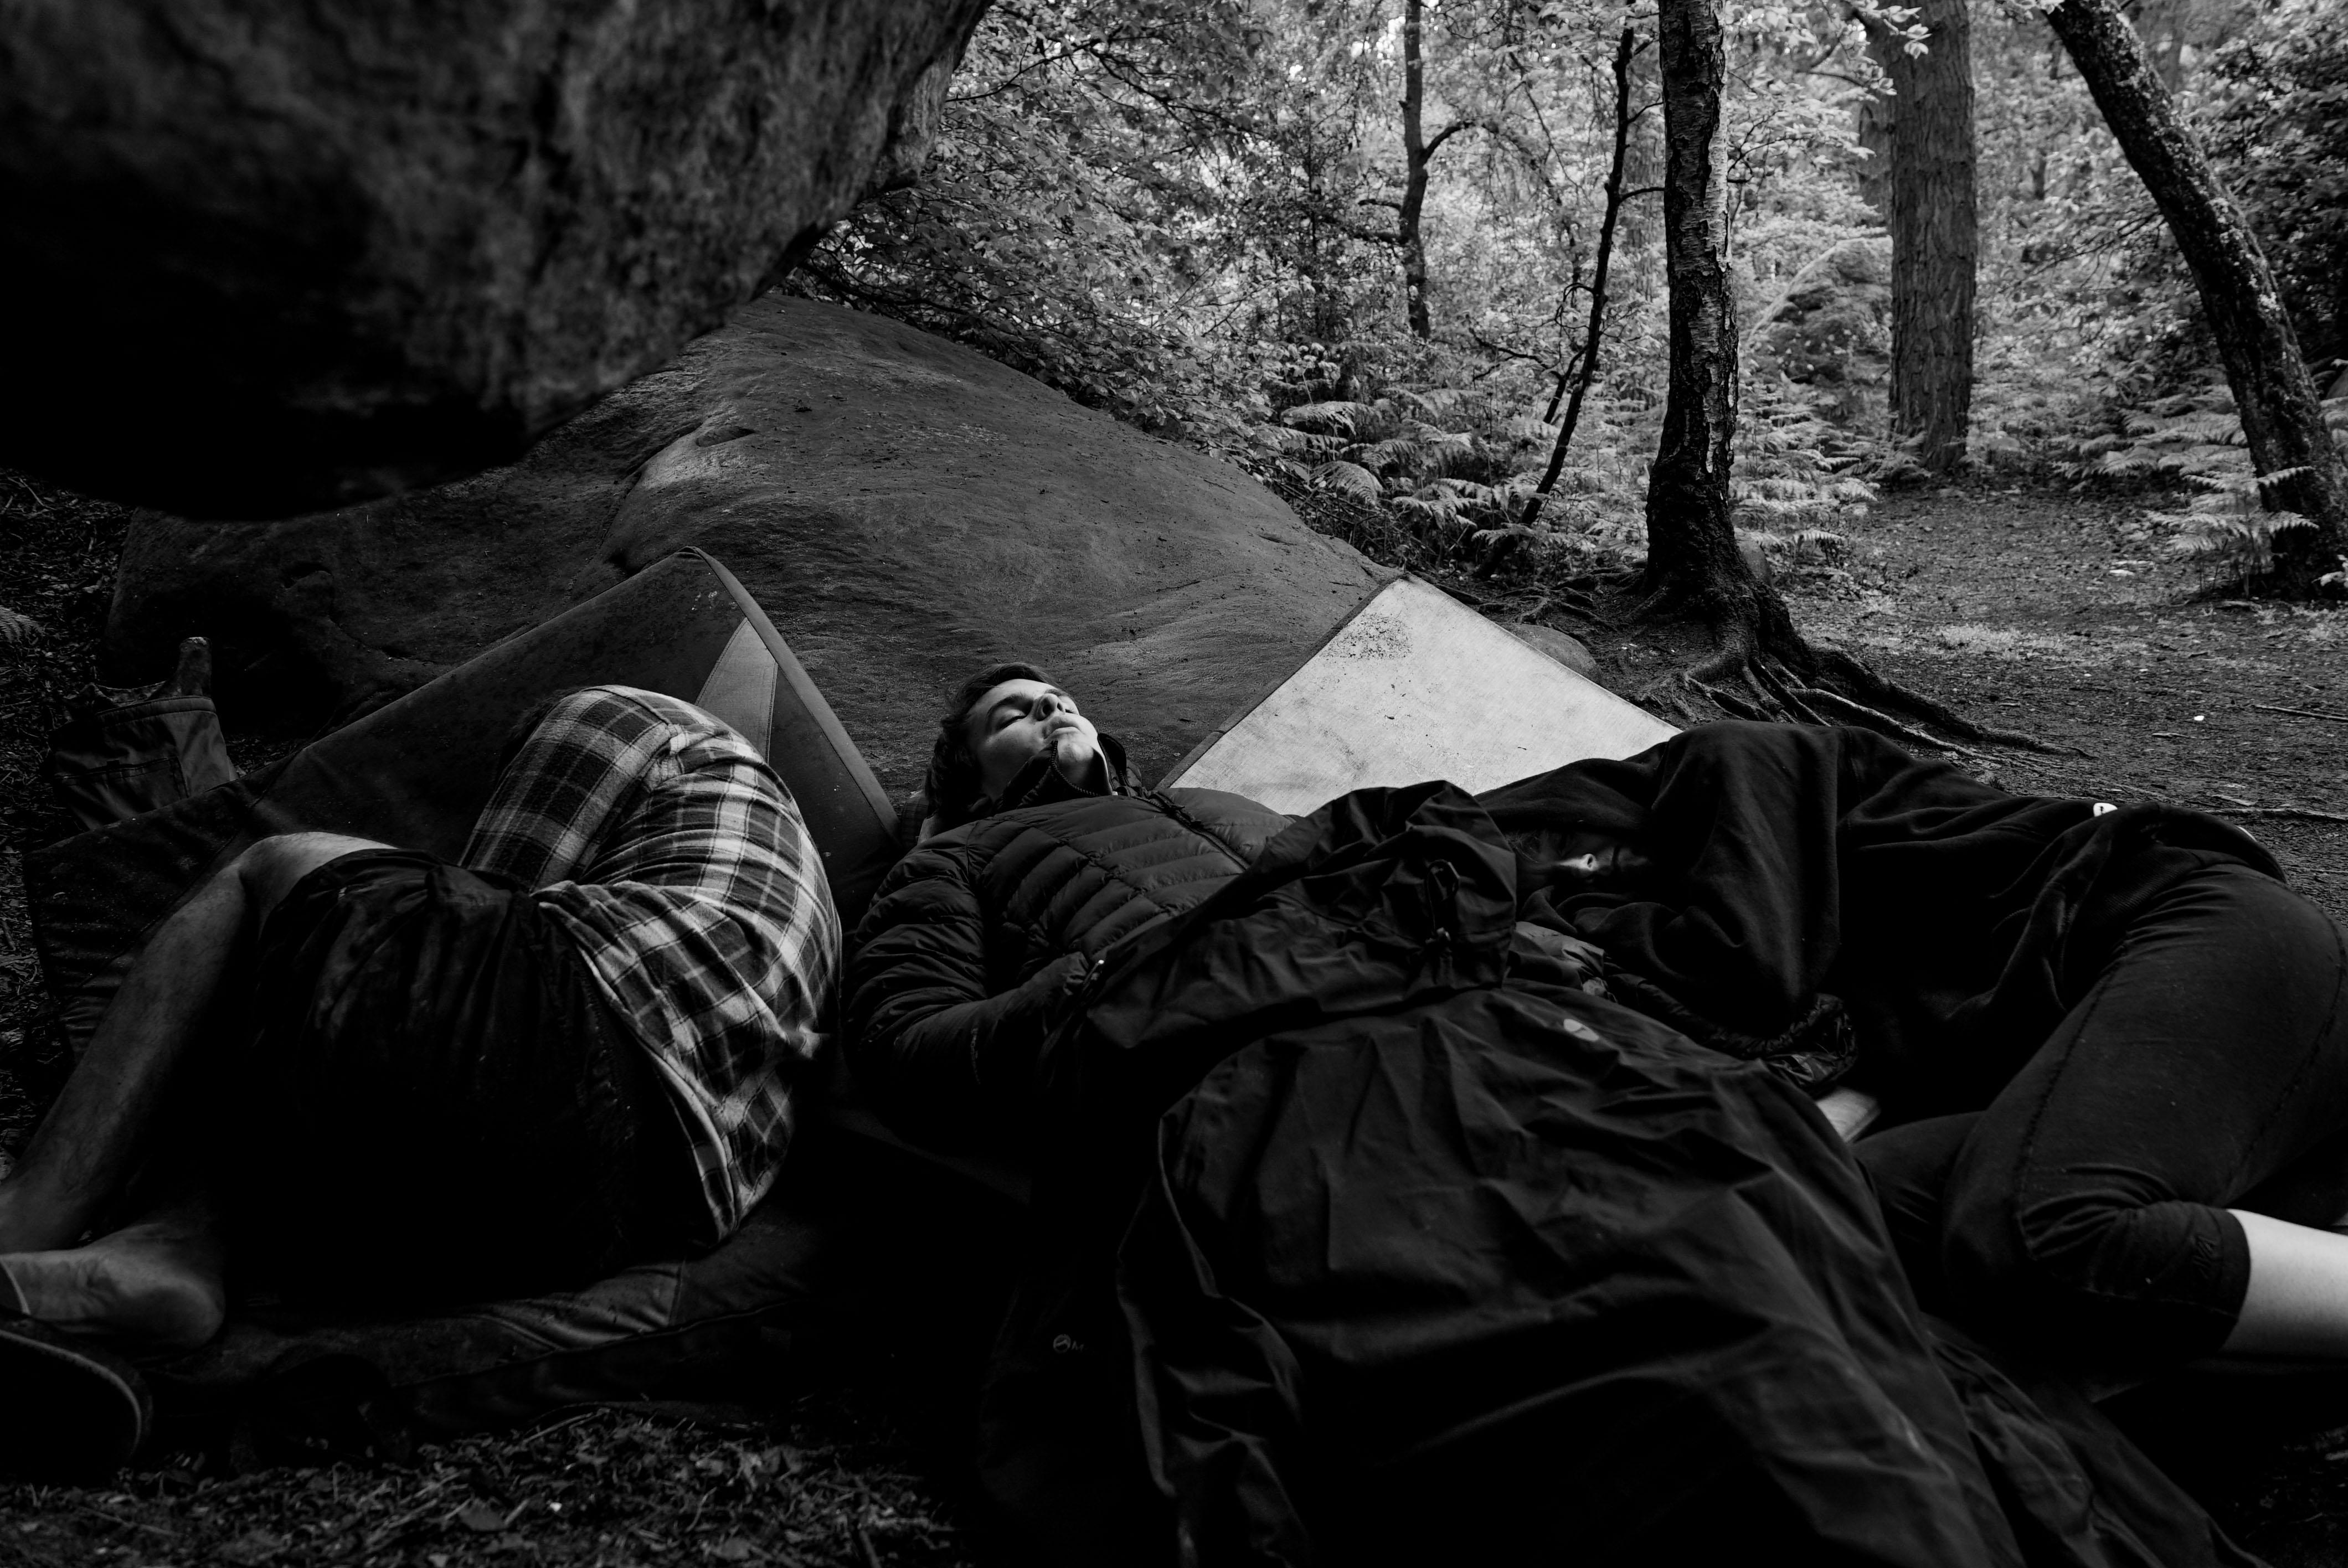 fontainbleau climbing 2016 mike brindley-44